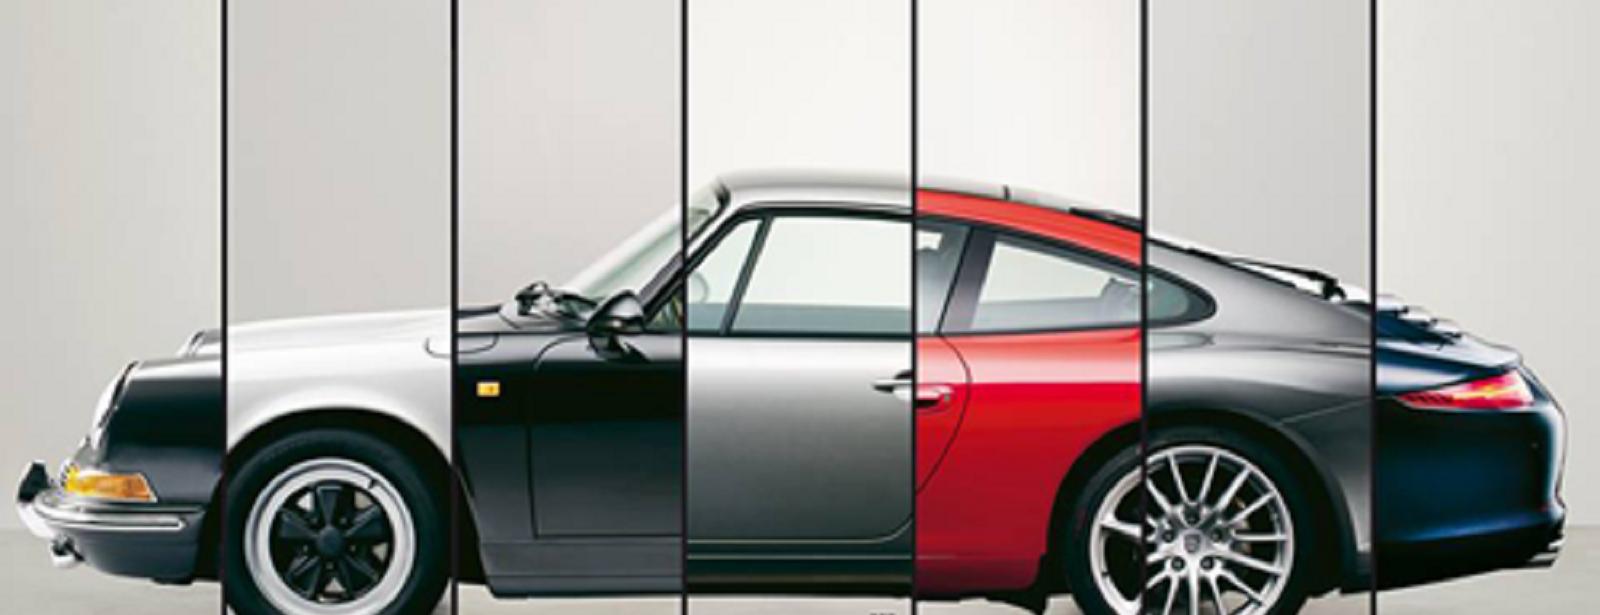 historique porsche 911 la marque porsche porsche club 911 classic france. Black Bedroom Furniture Sets. Home Design Ideas